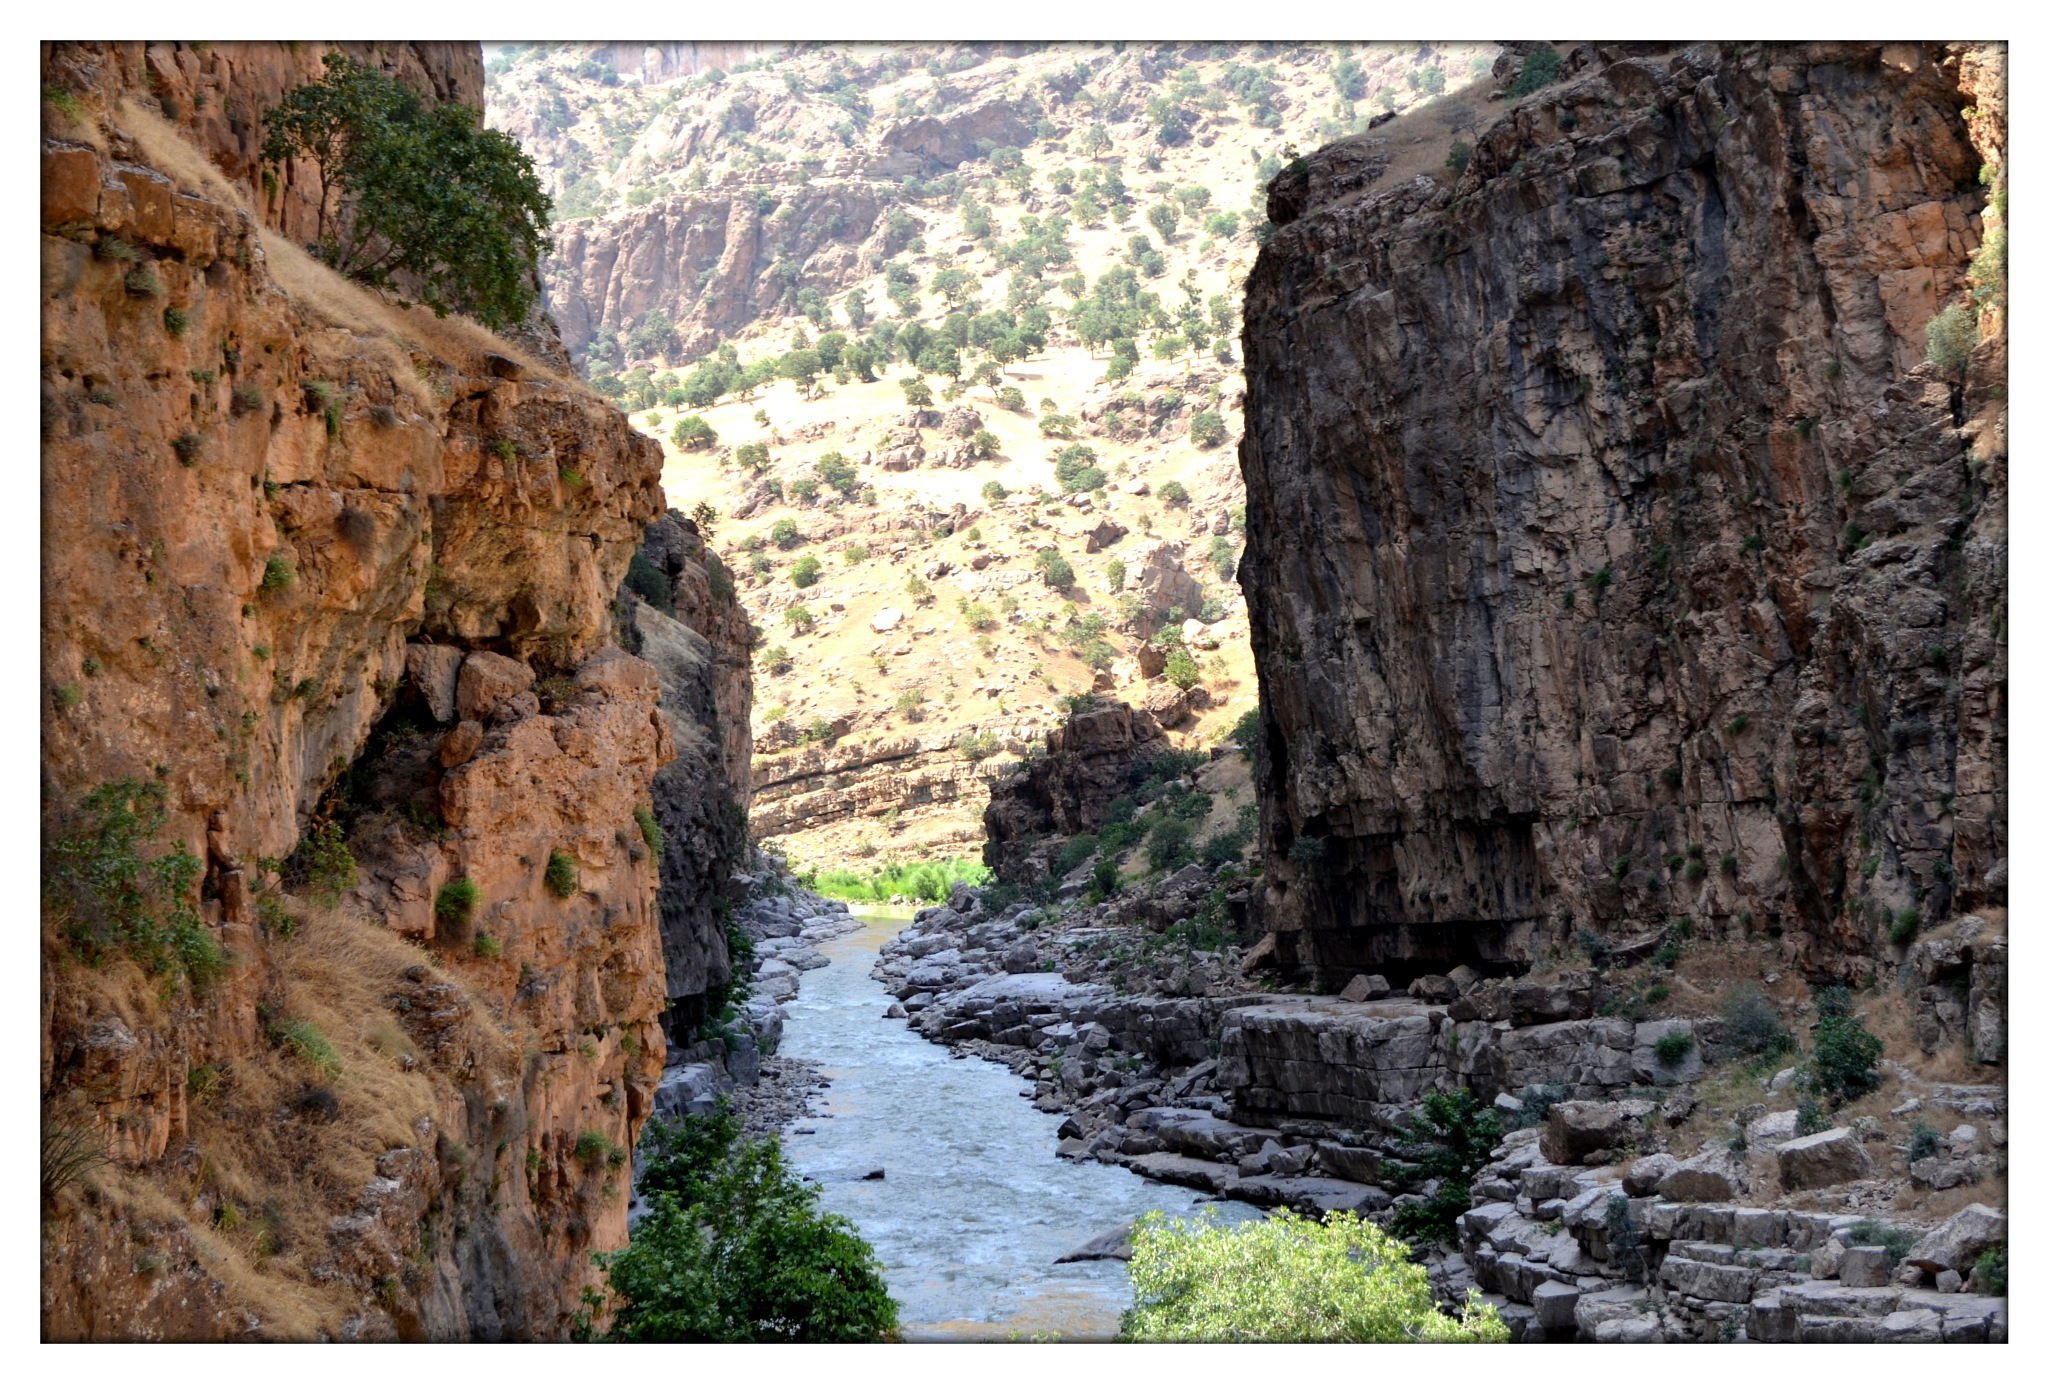 Kurdistan by Goran A. Ameen